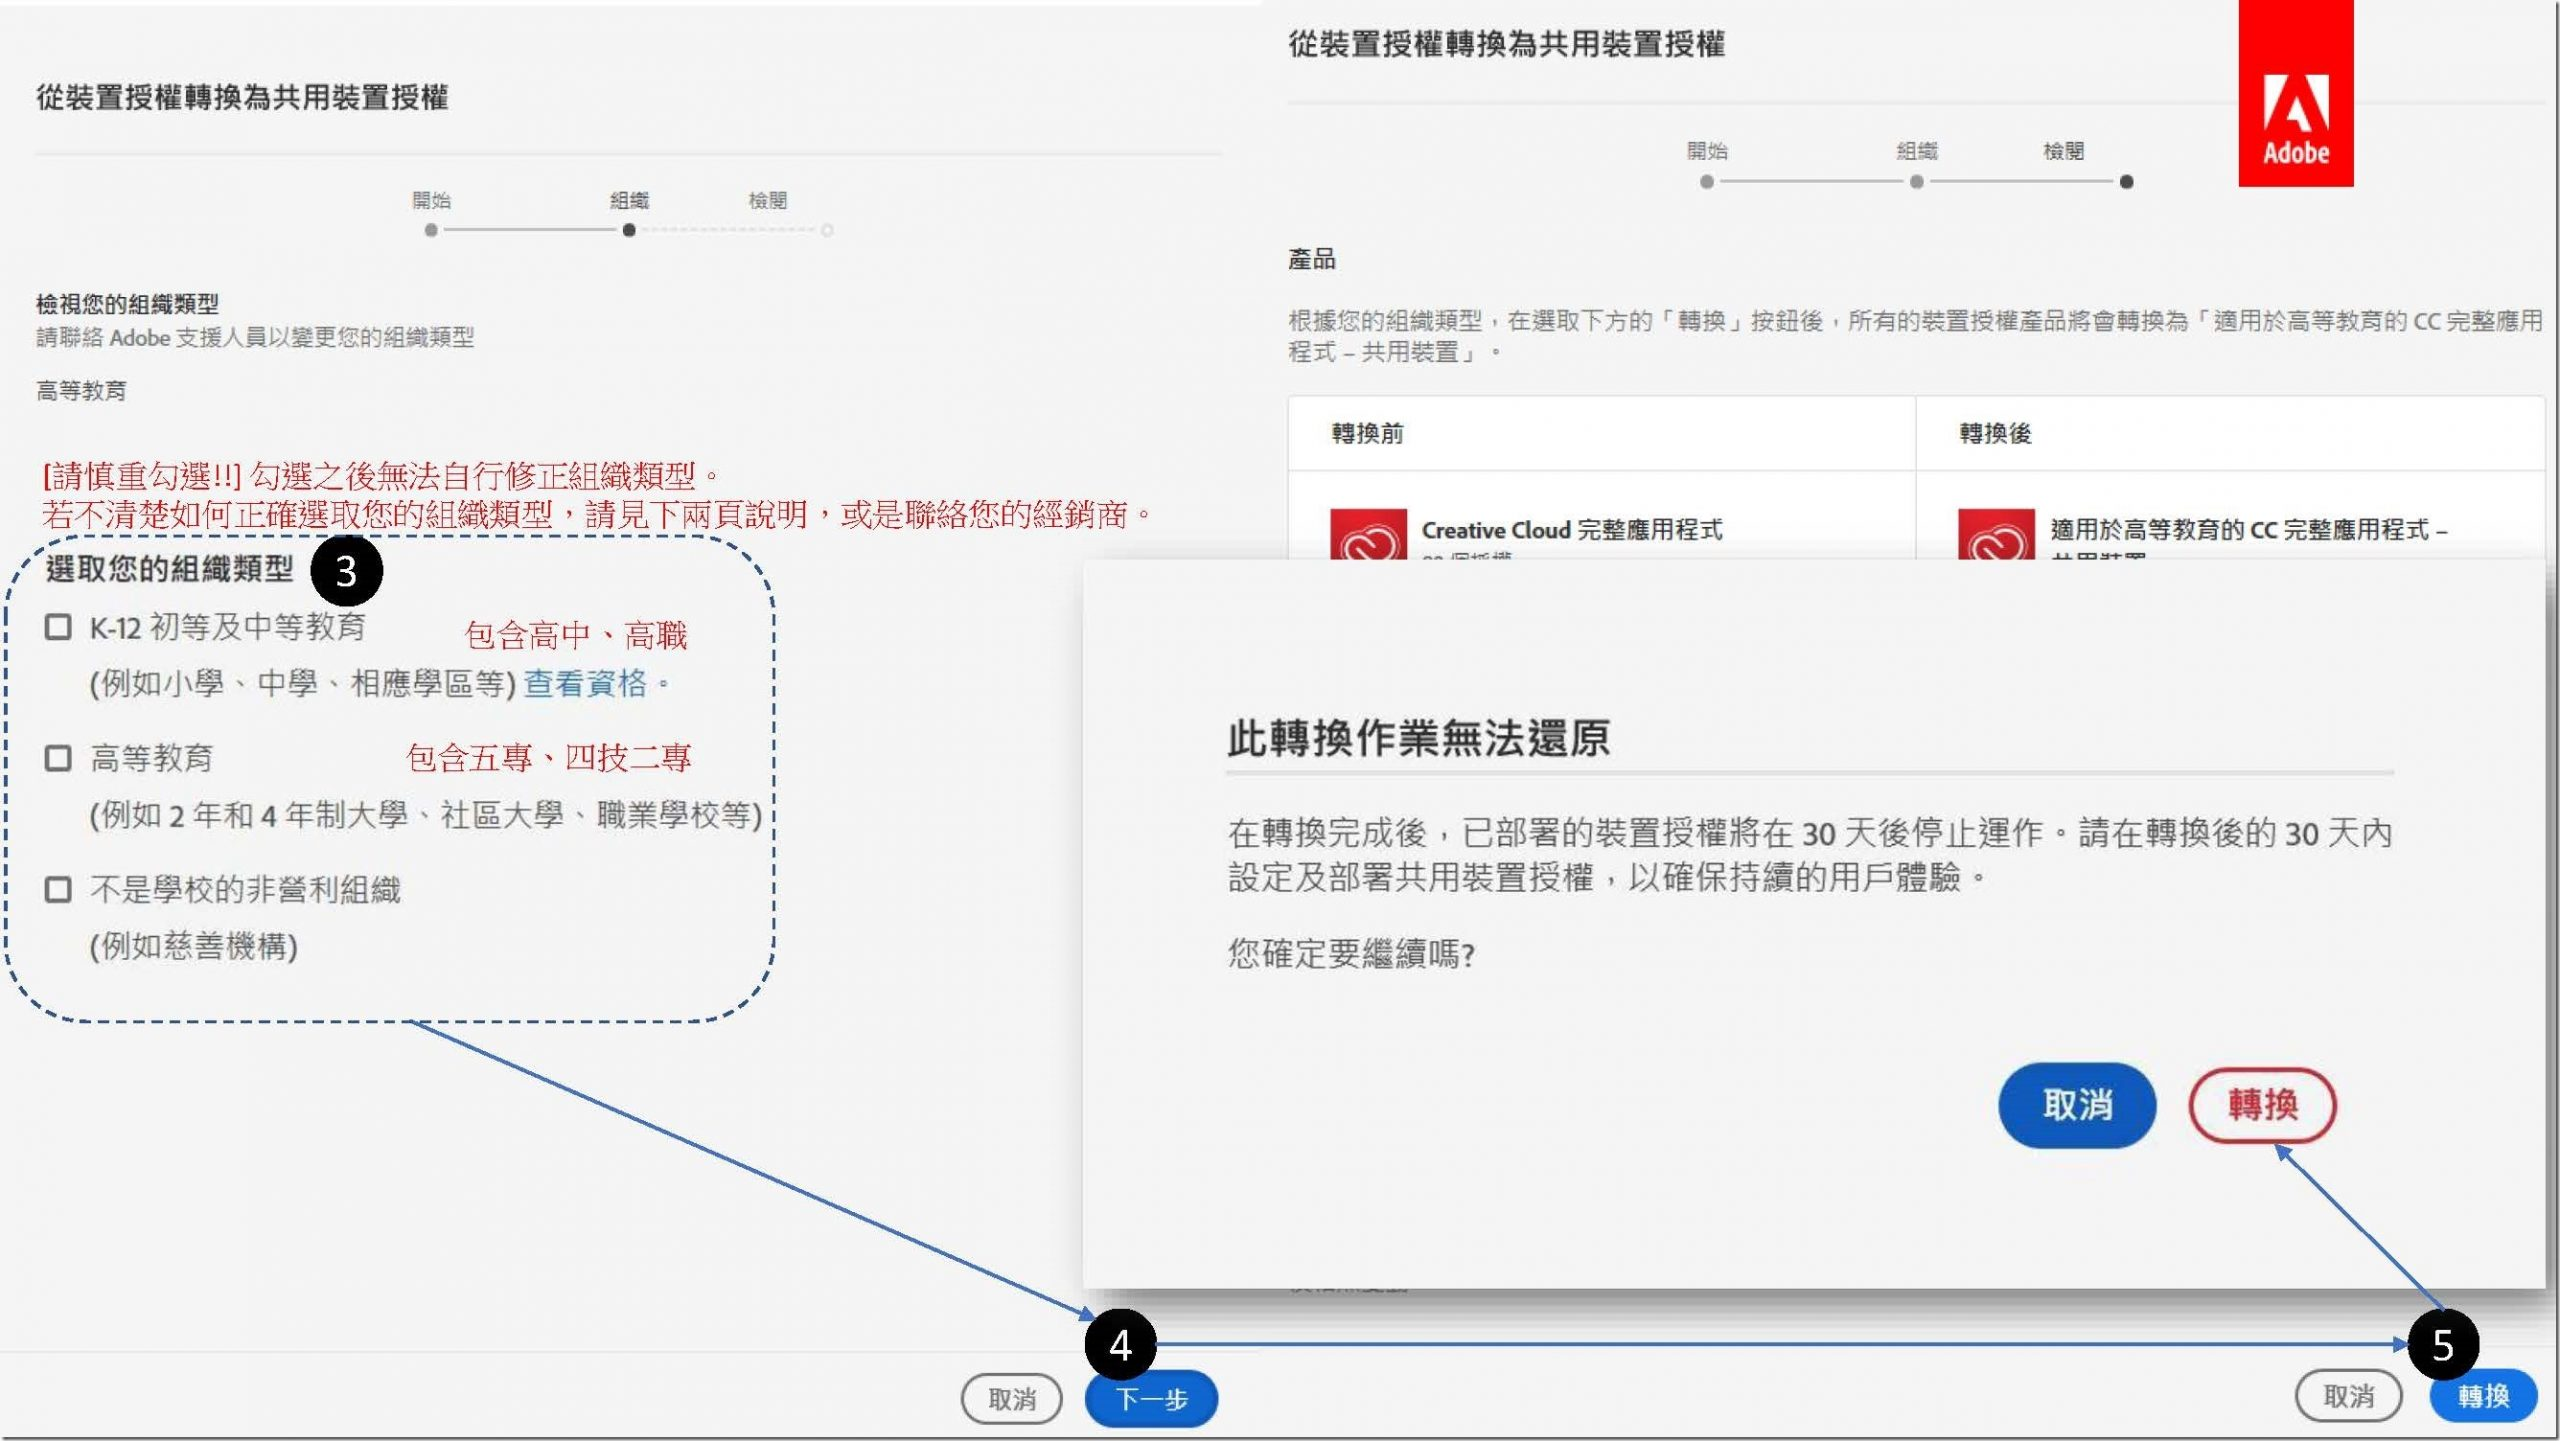 Adobe 共用裝置授權安裝指南_教育通用_頁面_06